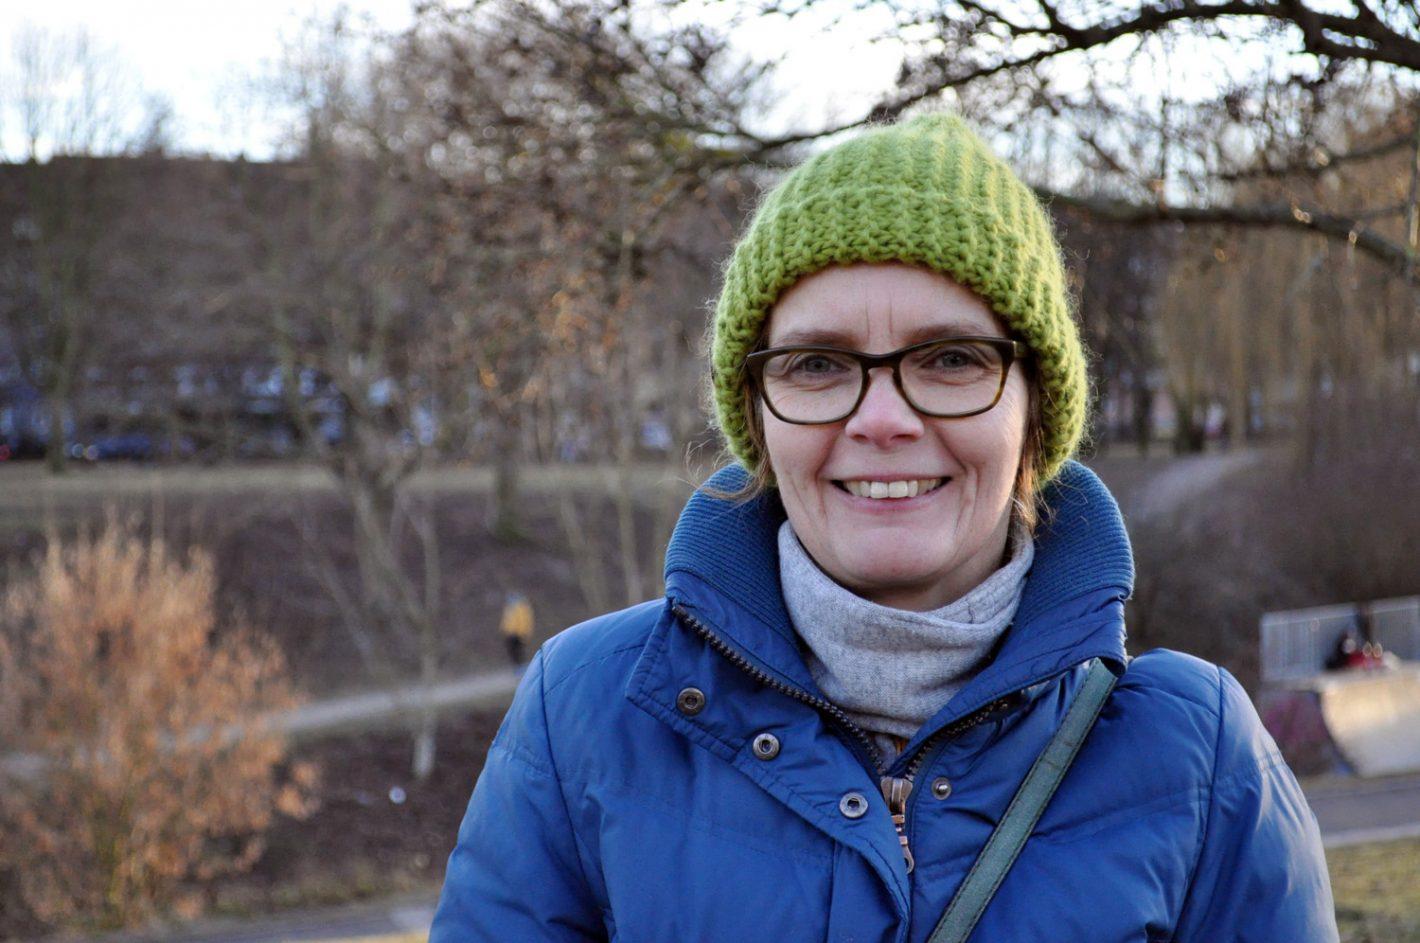 Frau mit Mütze im Park